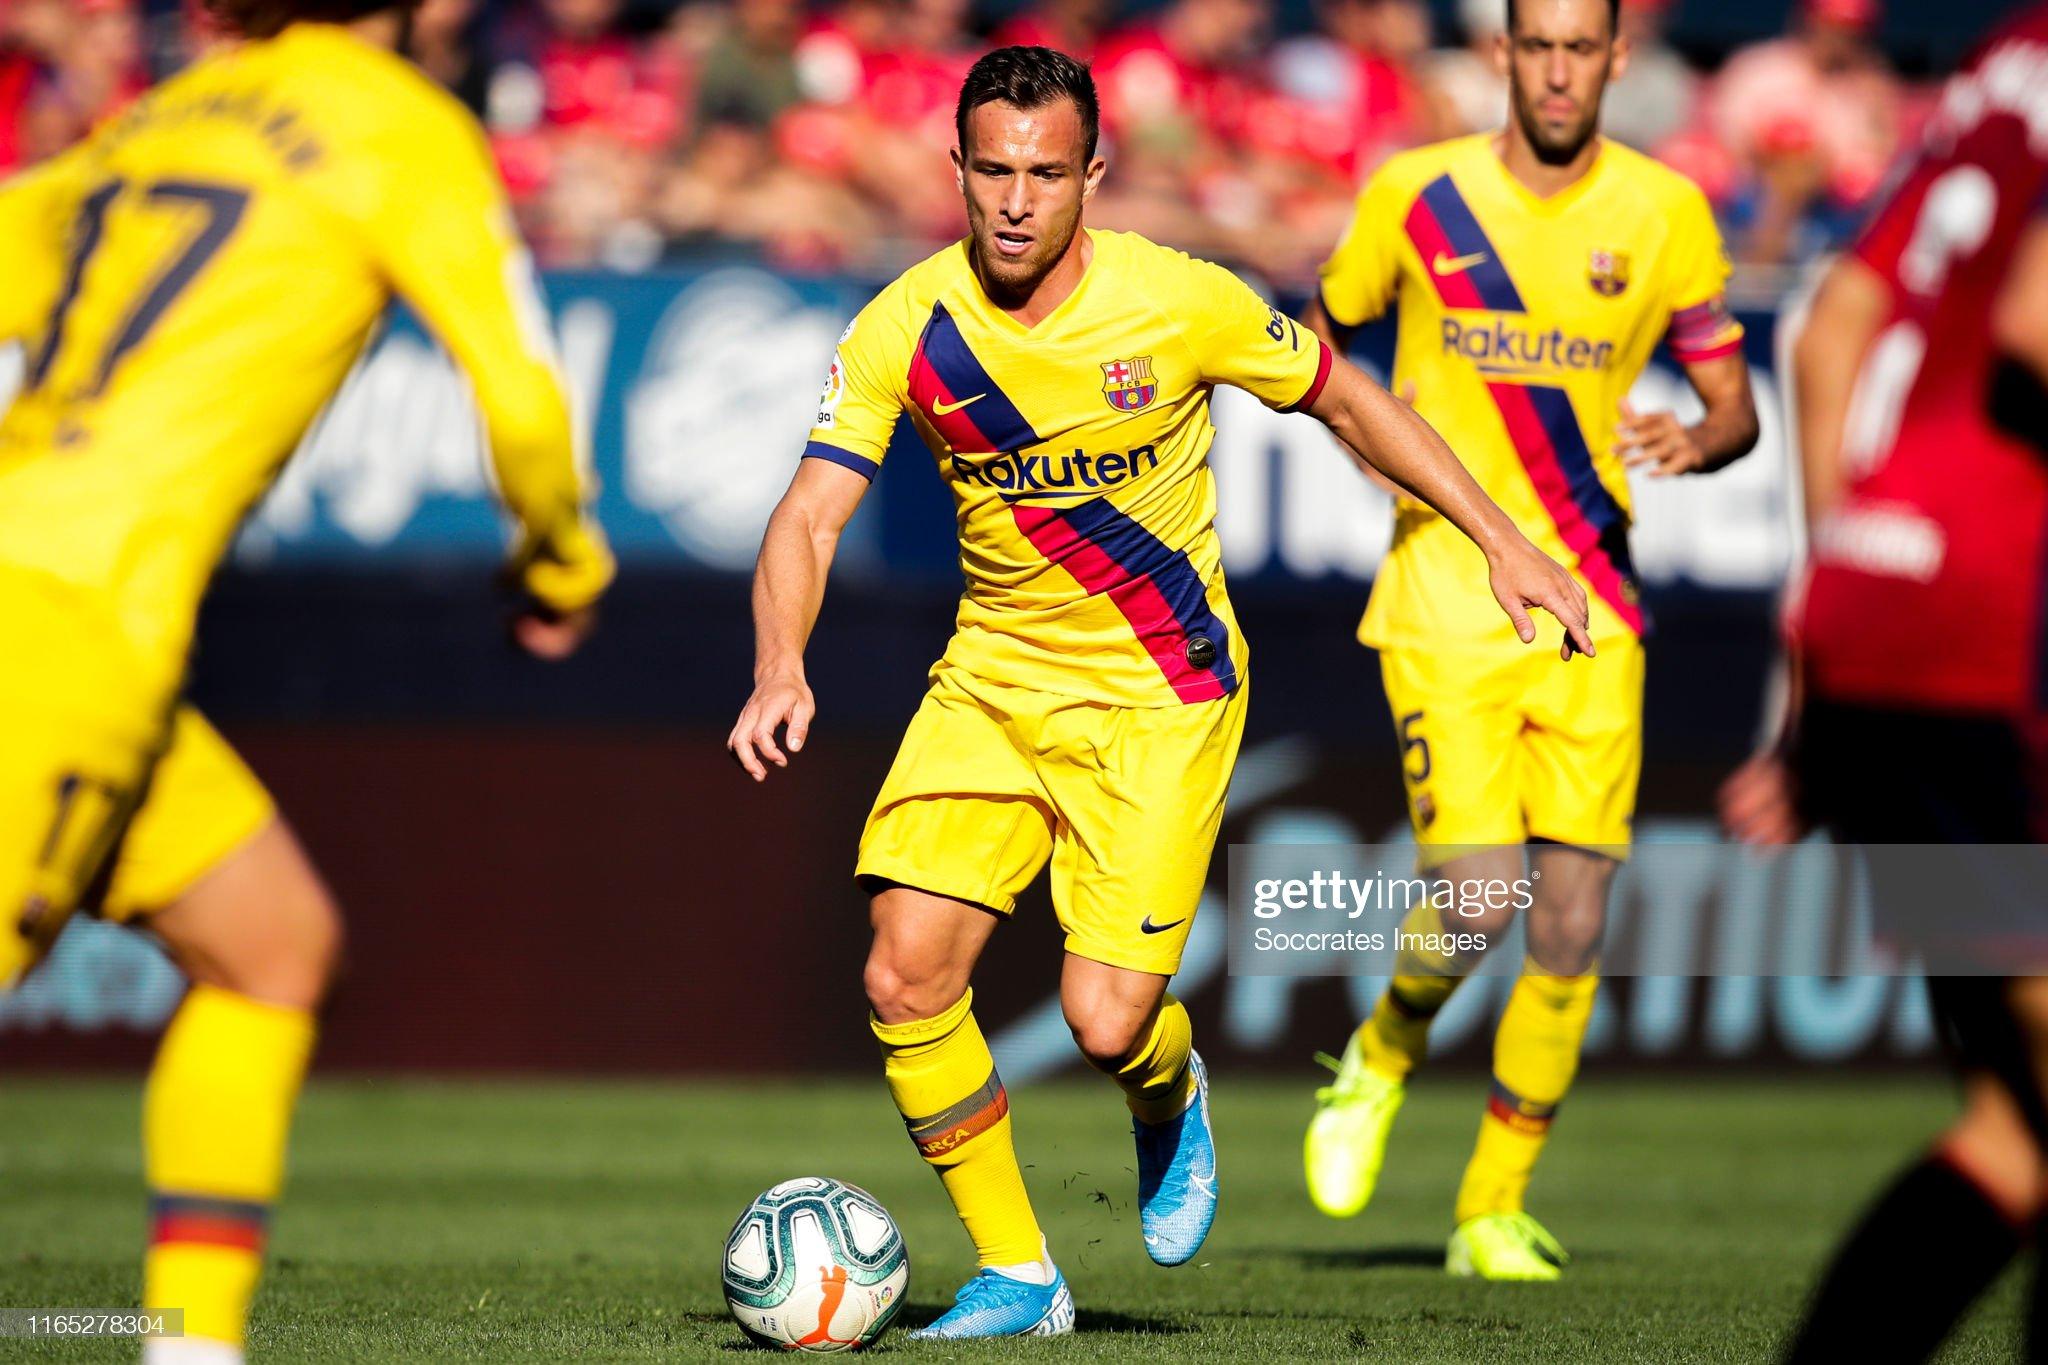 صور مباراة : أوساسونا - برشلونة 2-2 ( 31-08-2019 )  Arthur-of-fc-barcelona-during-the-la-liga-santander-match-between-v-picture-id1165278304?s=2048x2048